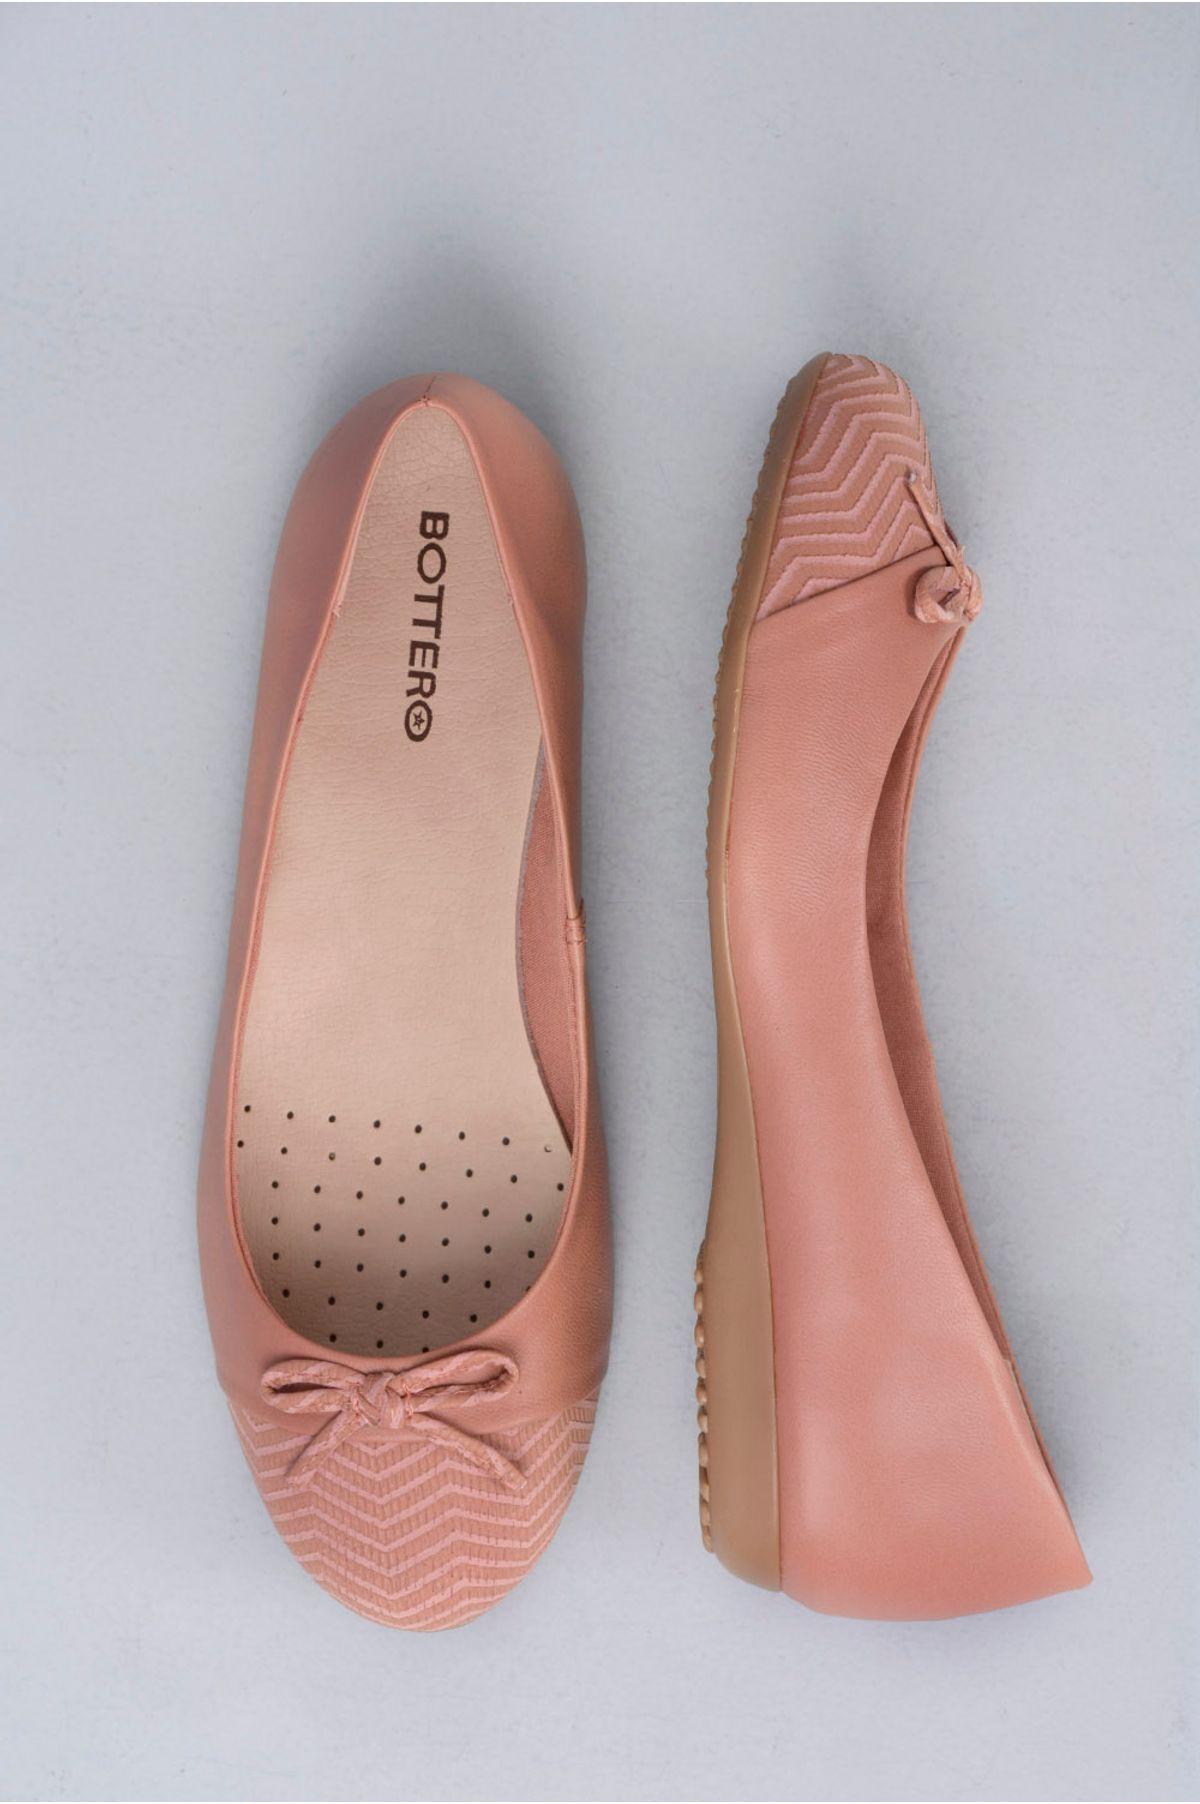 76cadc2e3a Sapatilha Feminina Caryn Bottero CR - ROSA - Mundial Calçados